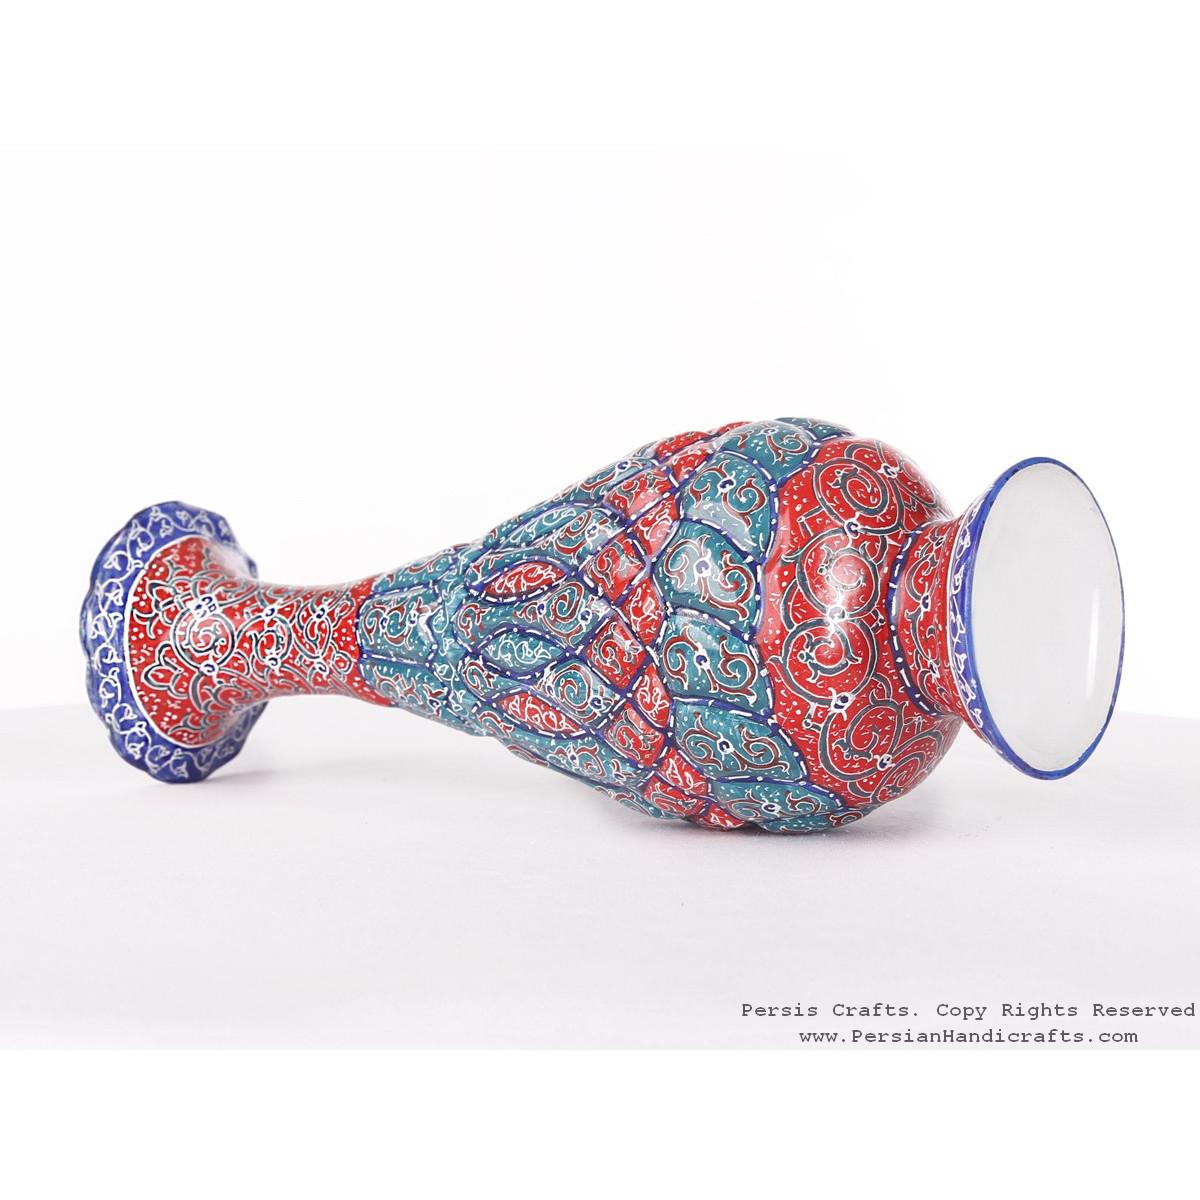 Enamel (Minakari) Flower Vase - HE3611-Persian Handicrafts